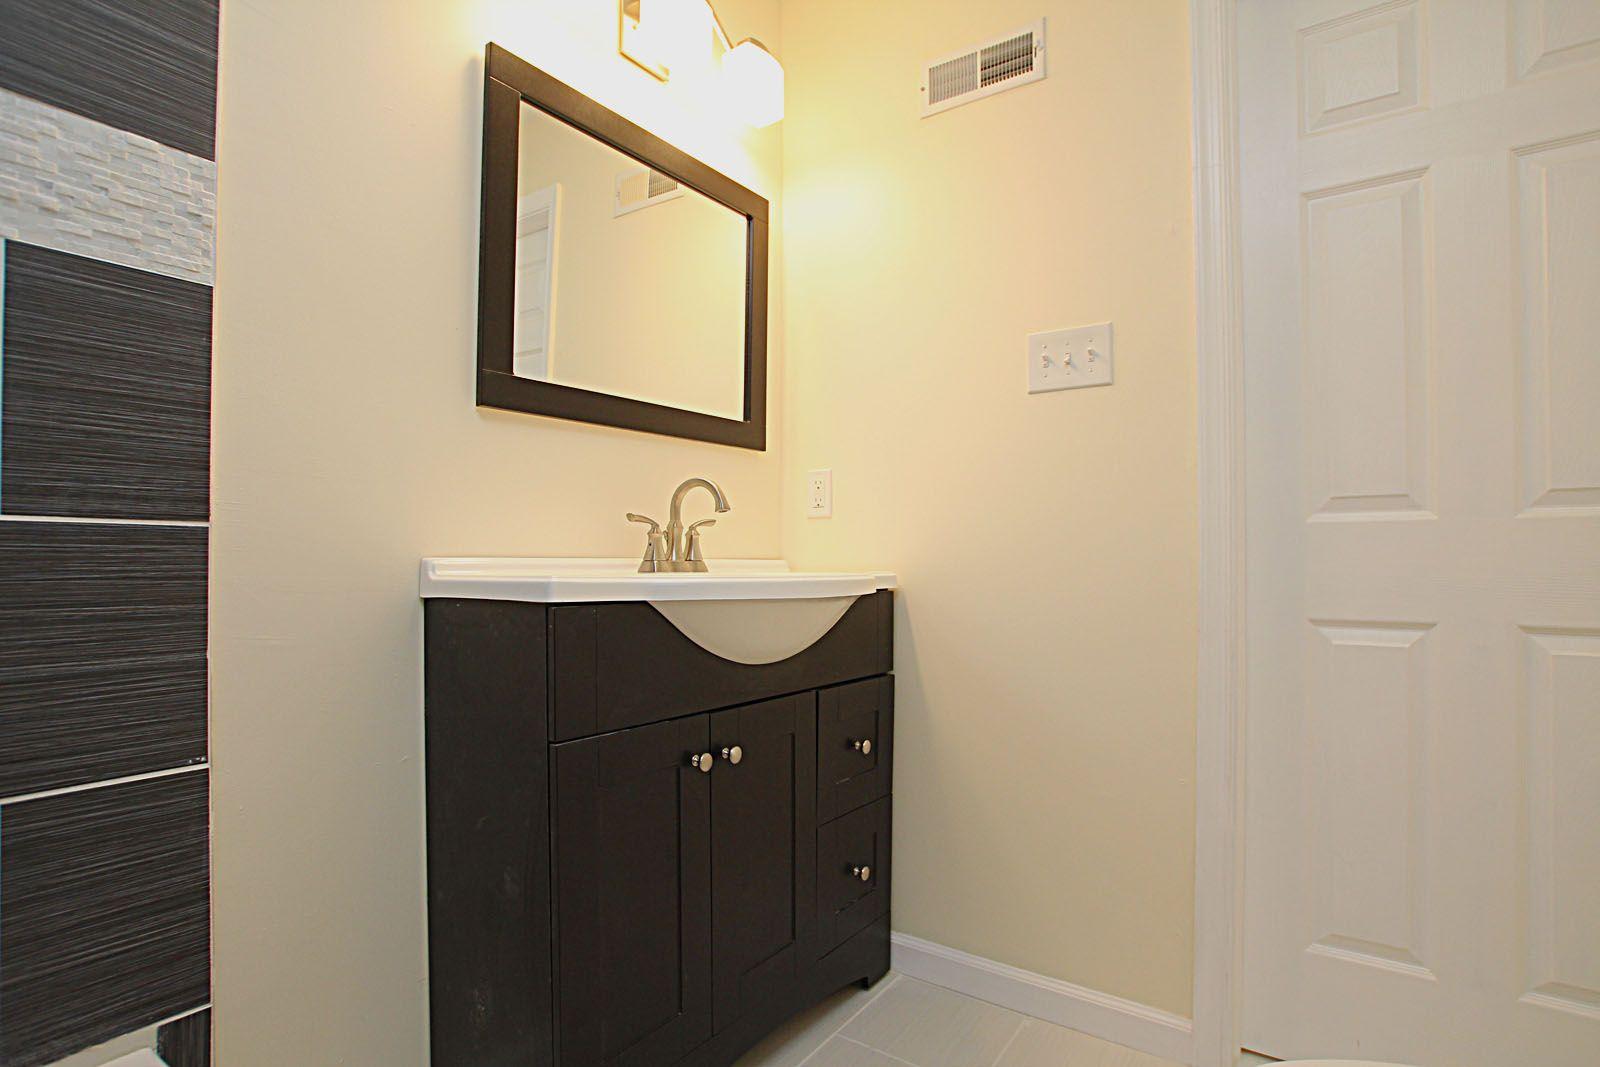 designer vanity and custom mirror in the bathroom built on custom bathroom vanity mirrors id=24793